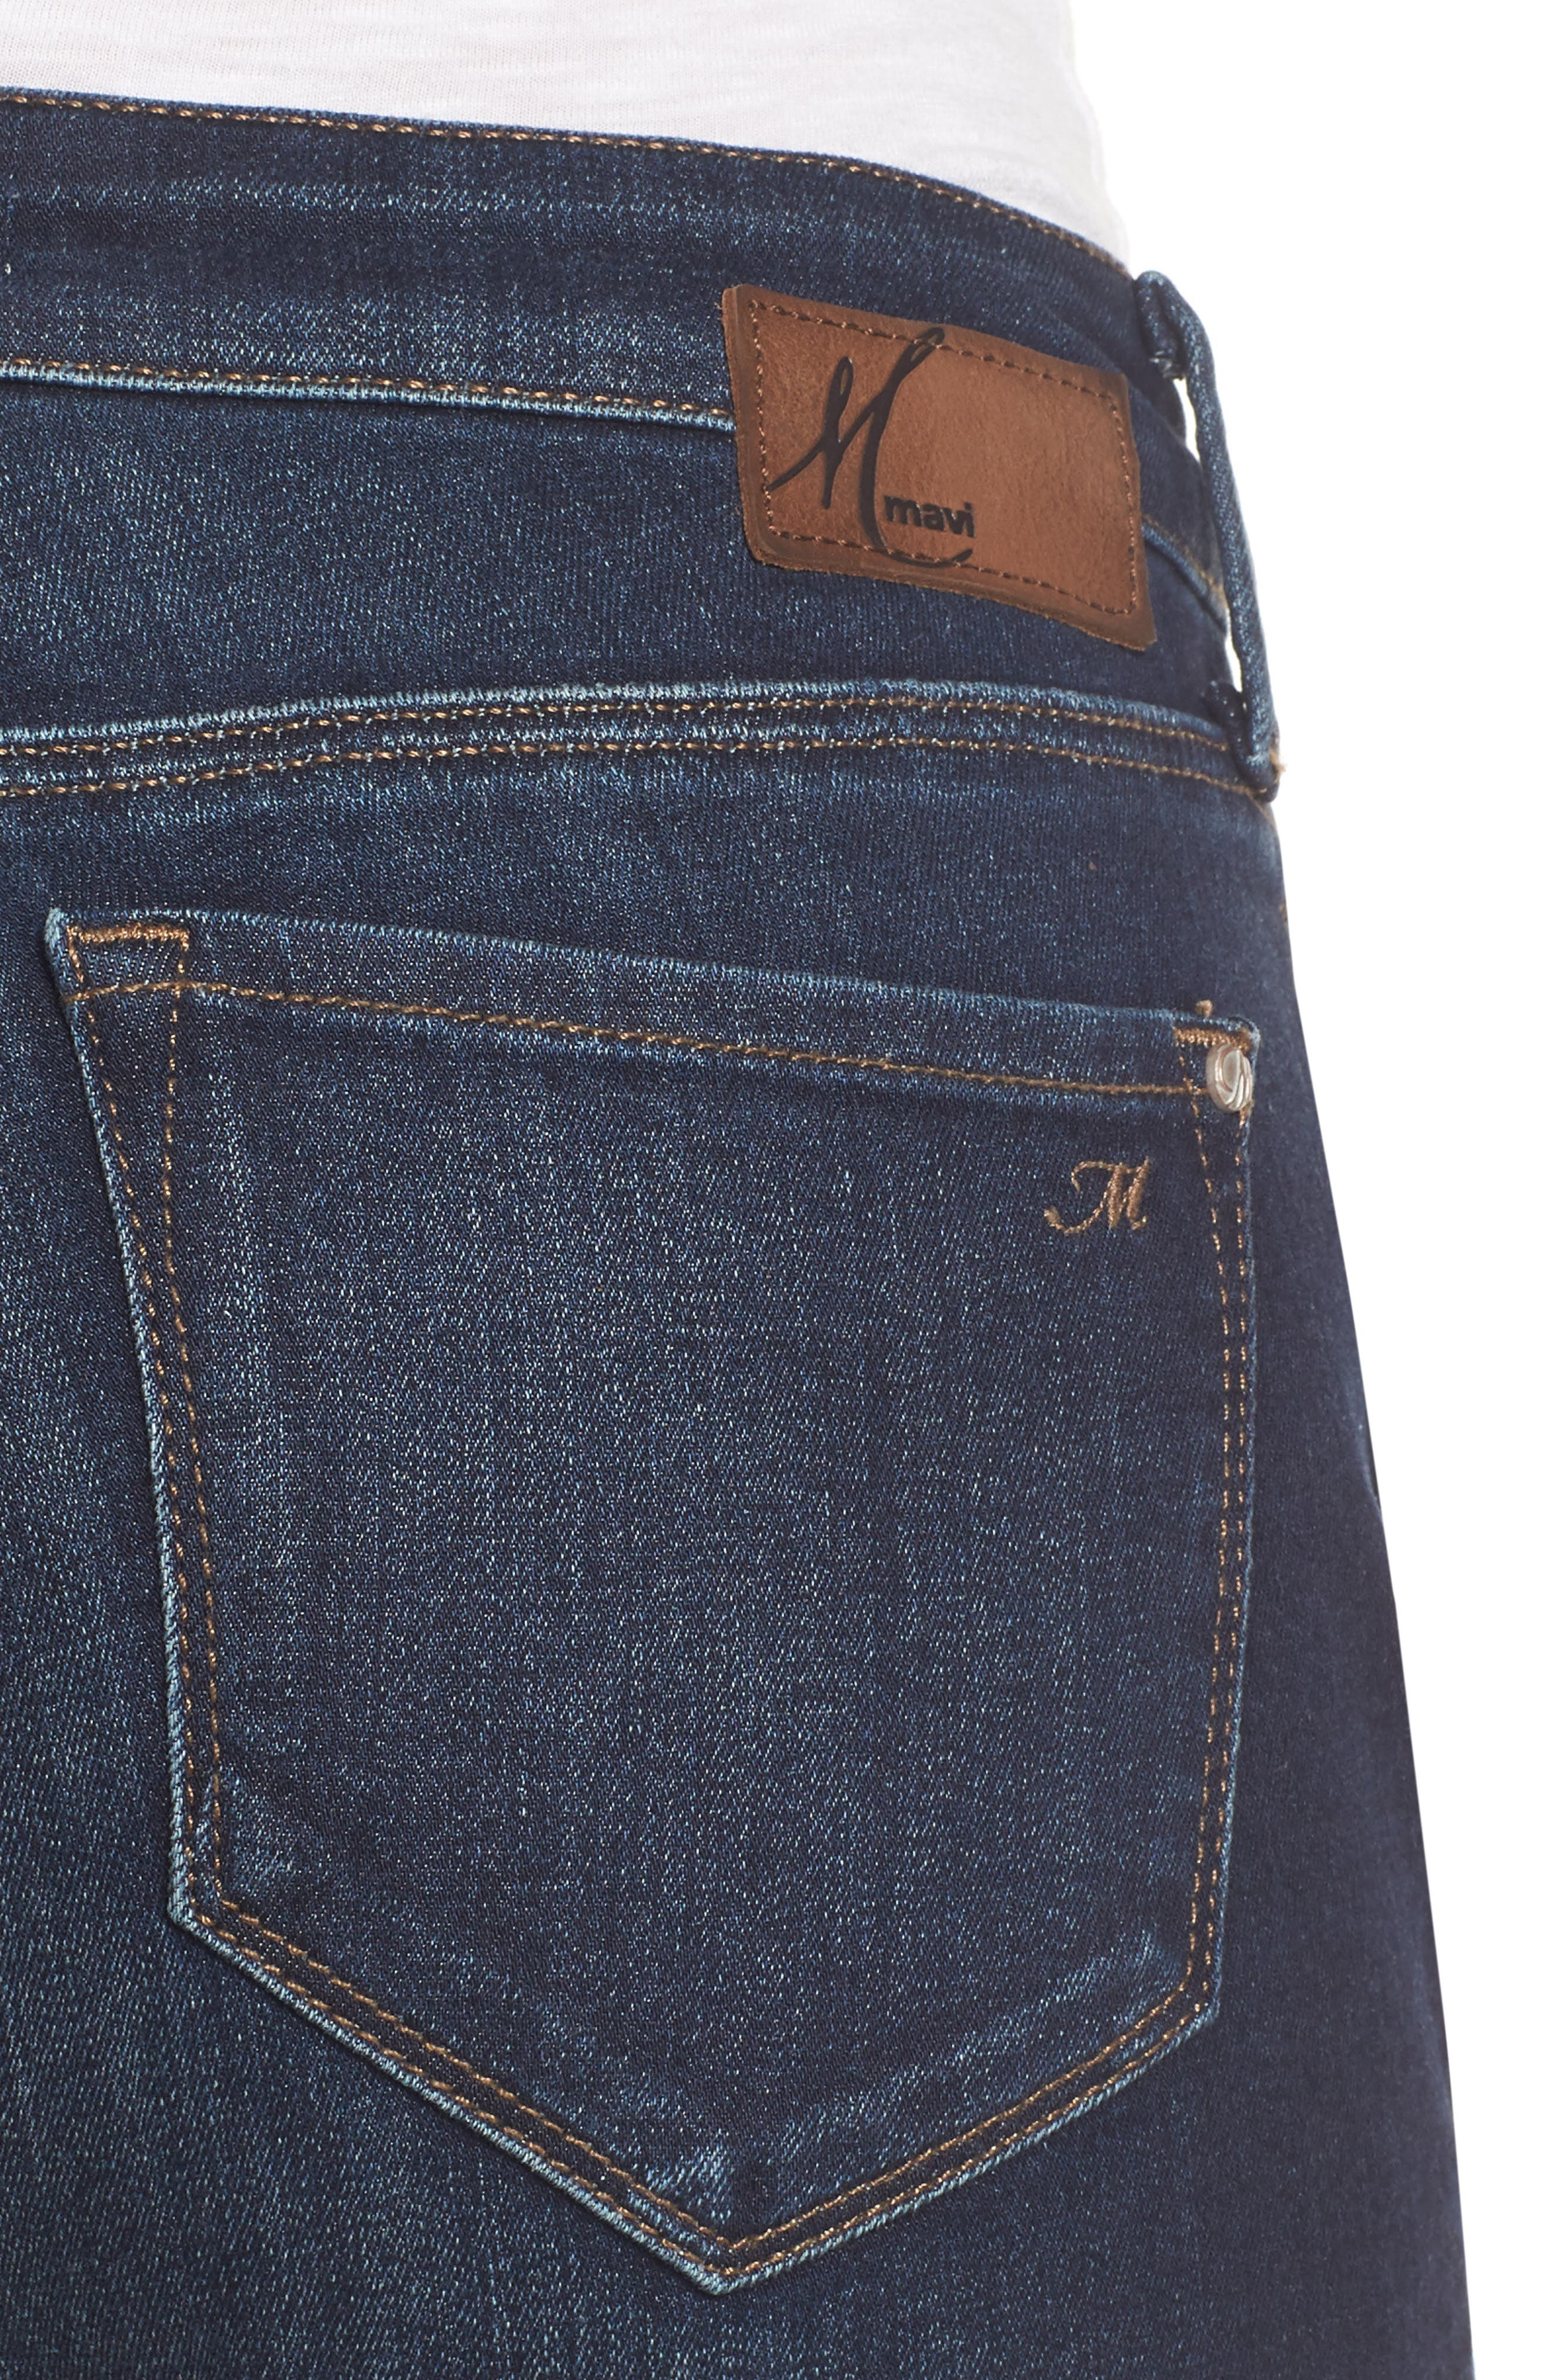 Ada Boyfriend Jeans,                             Alternate thumbnail 4, color,                             INDIGO BRUSHED